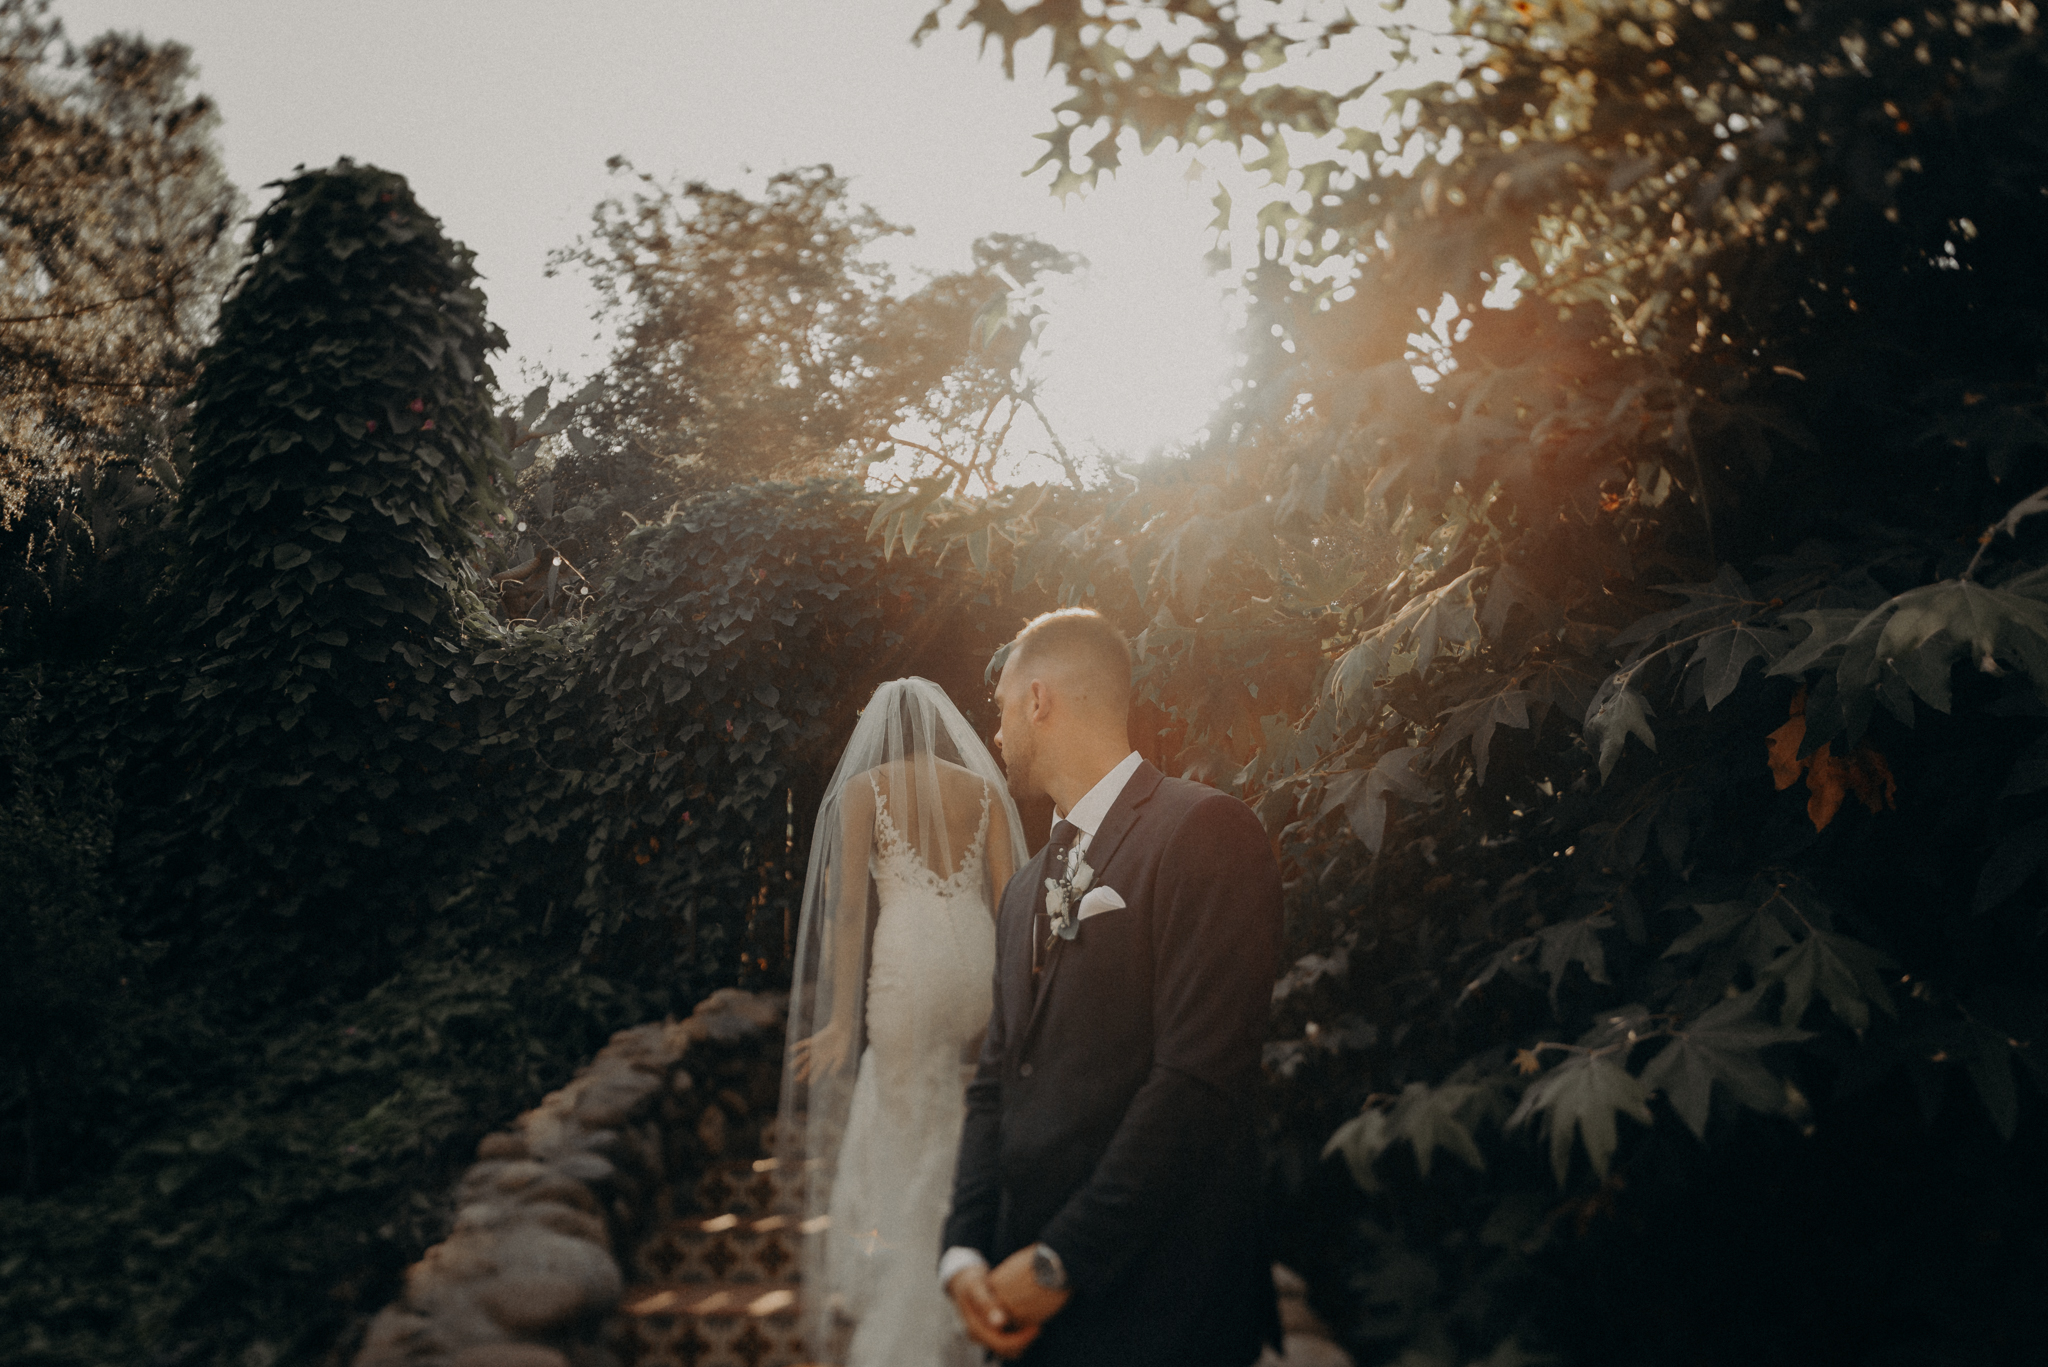 Isaiah + Taylor Photography - Rancho Las Lomas Wedding, Los Angeles Wedding Photographer-109.jpg